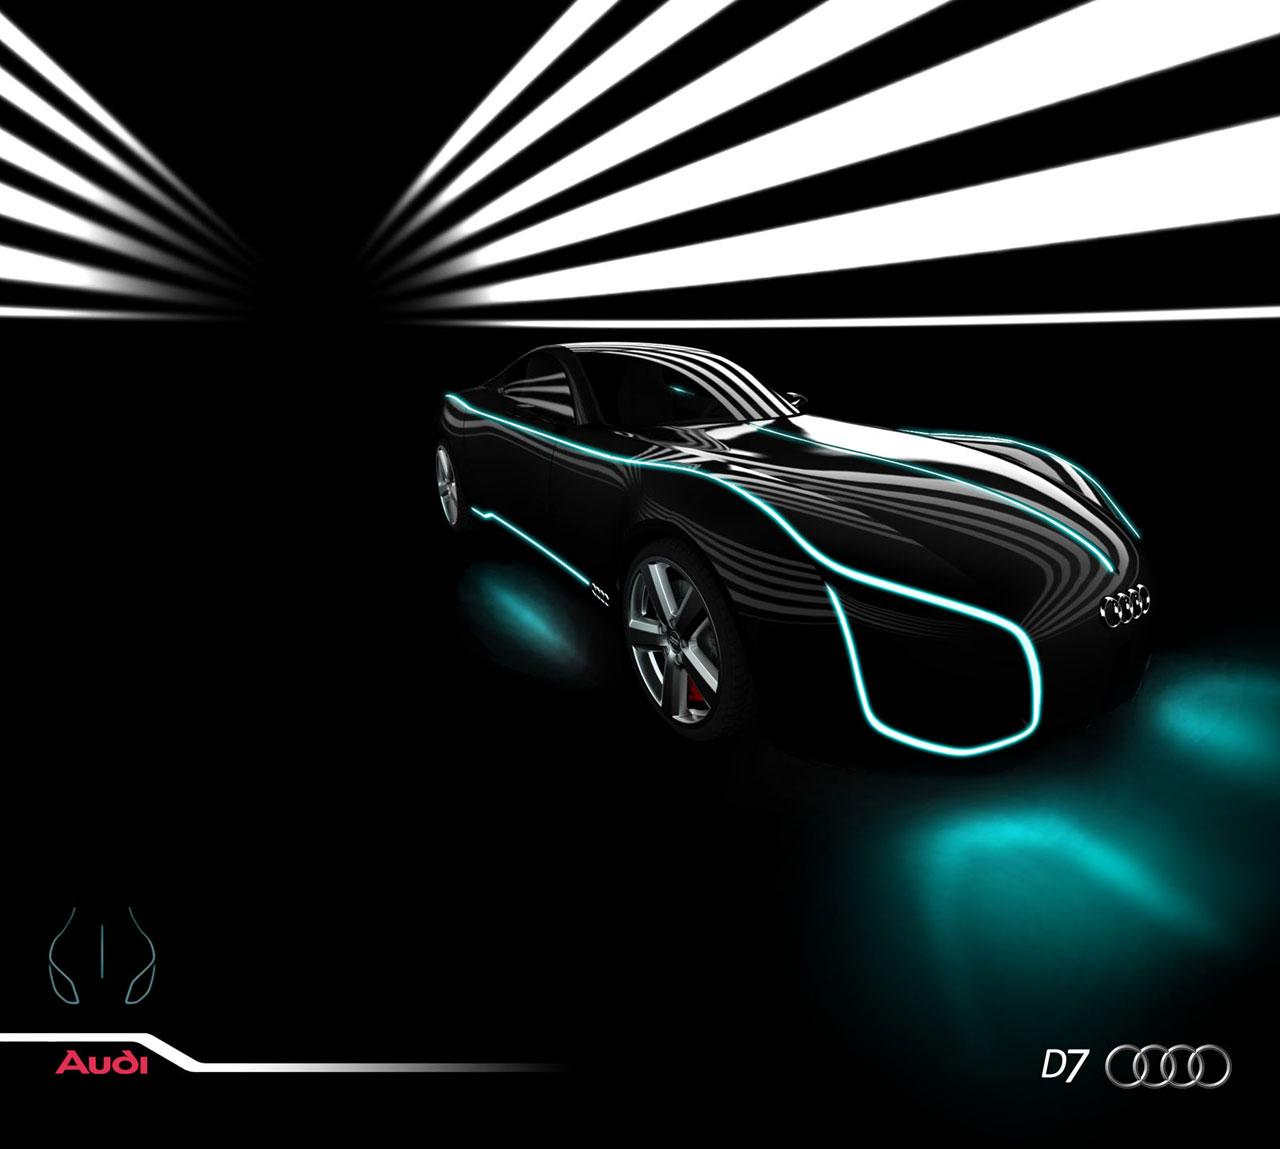 Audi D7 car concept